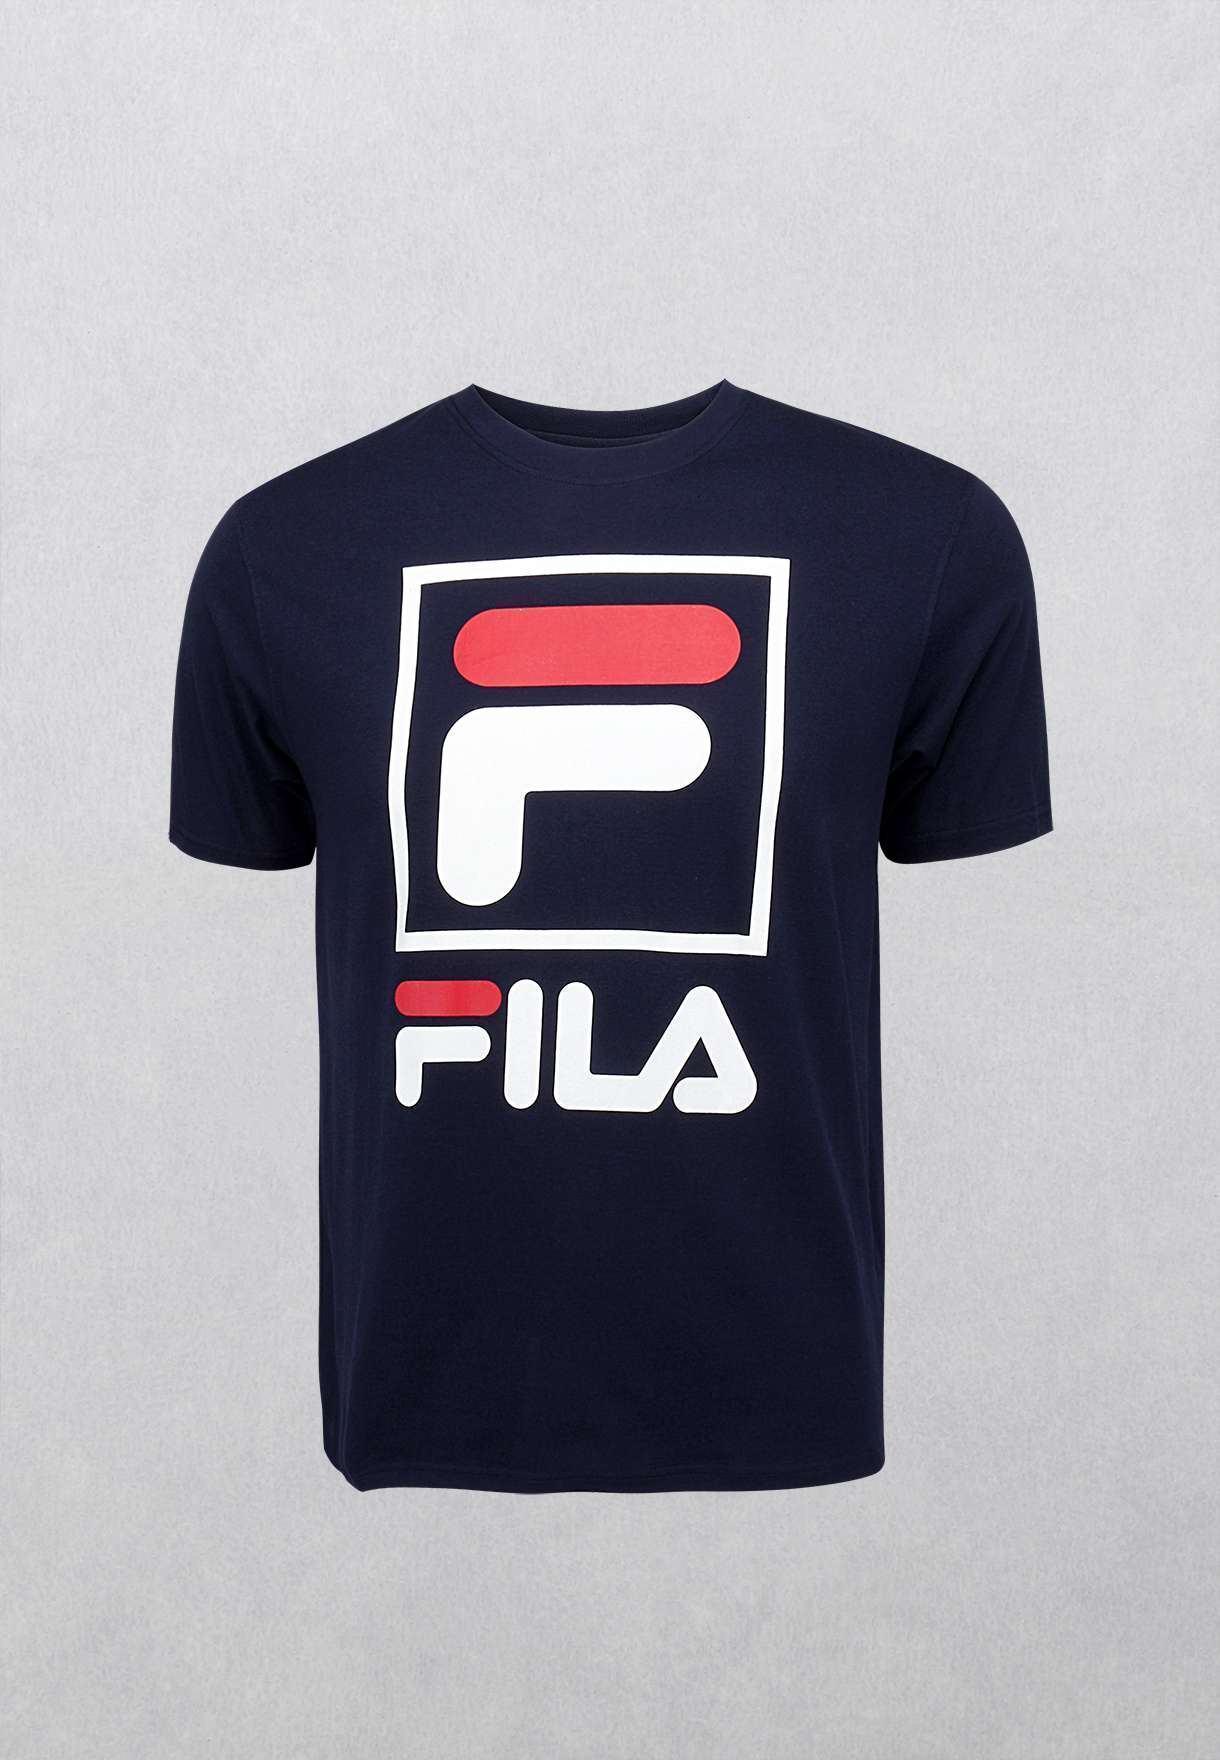 Felix Graphic T-Shirt